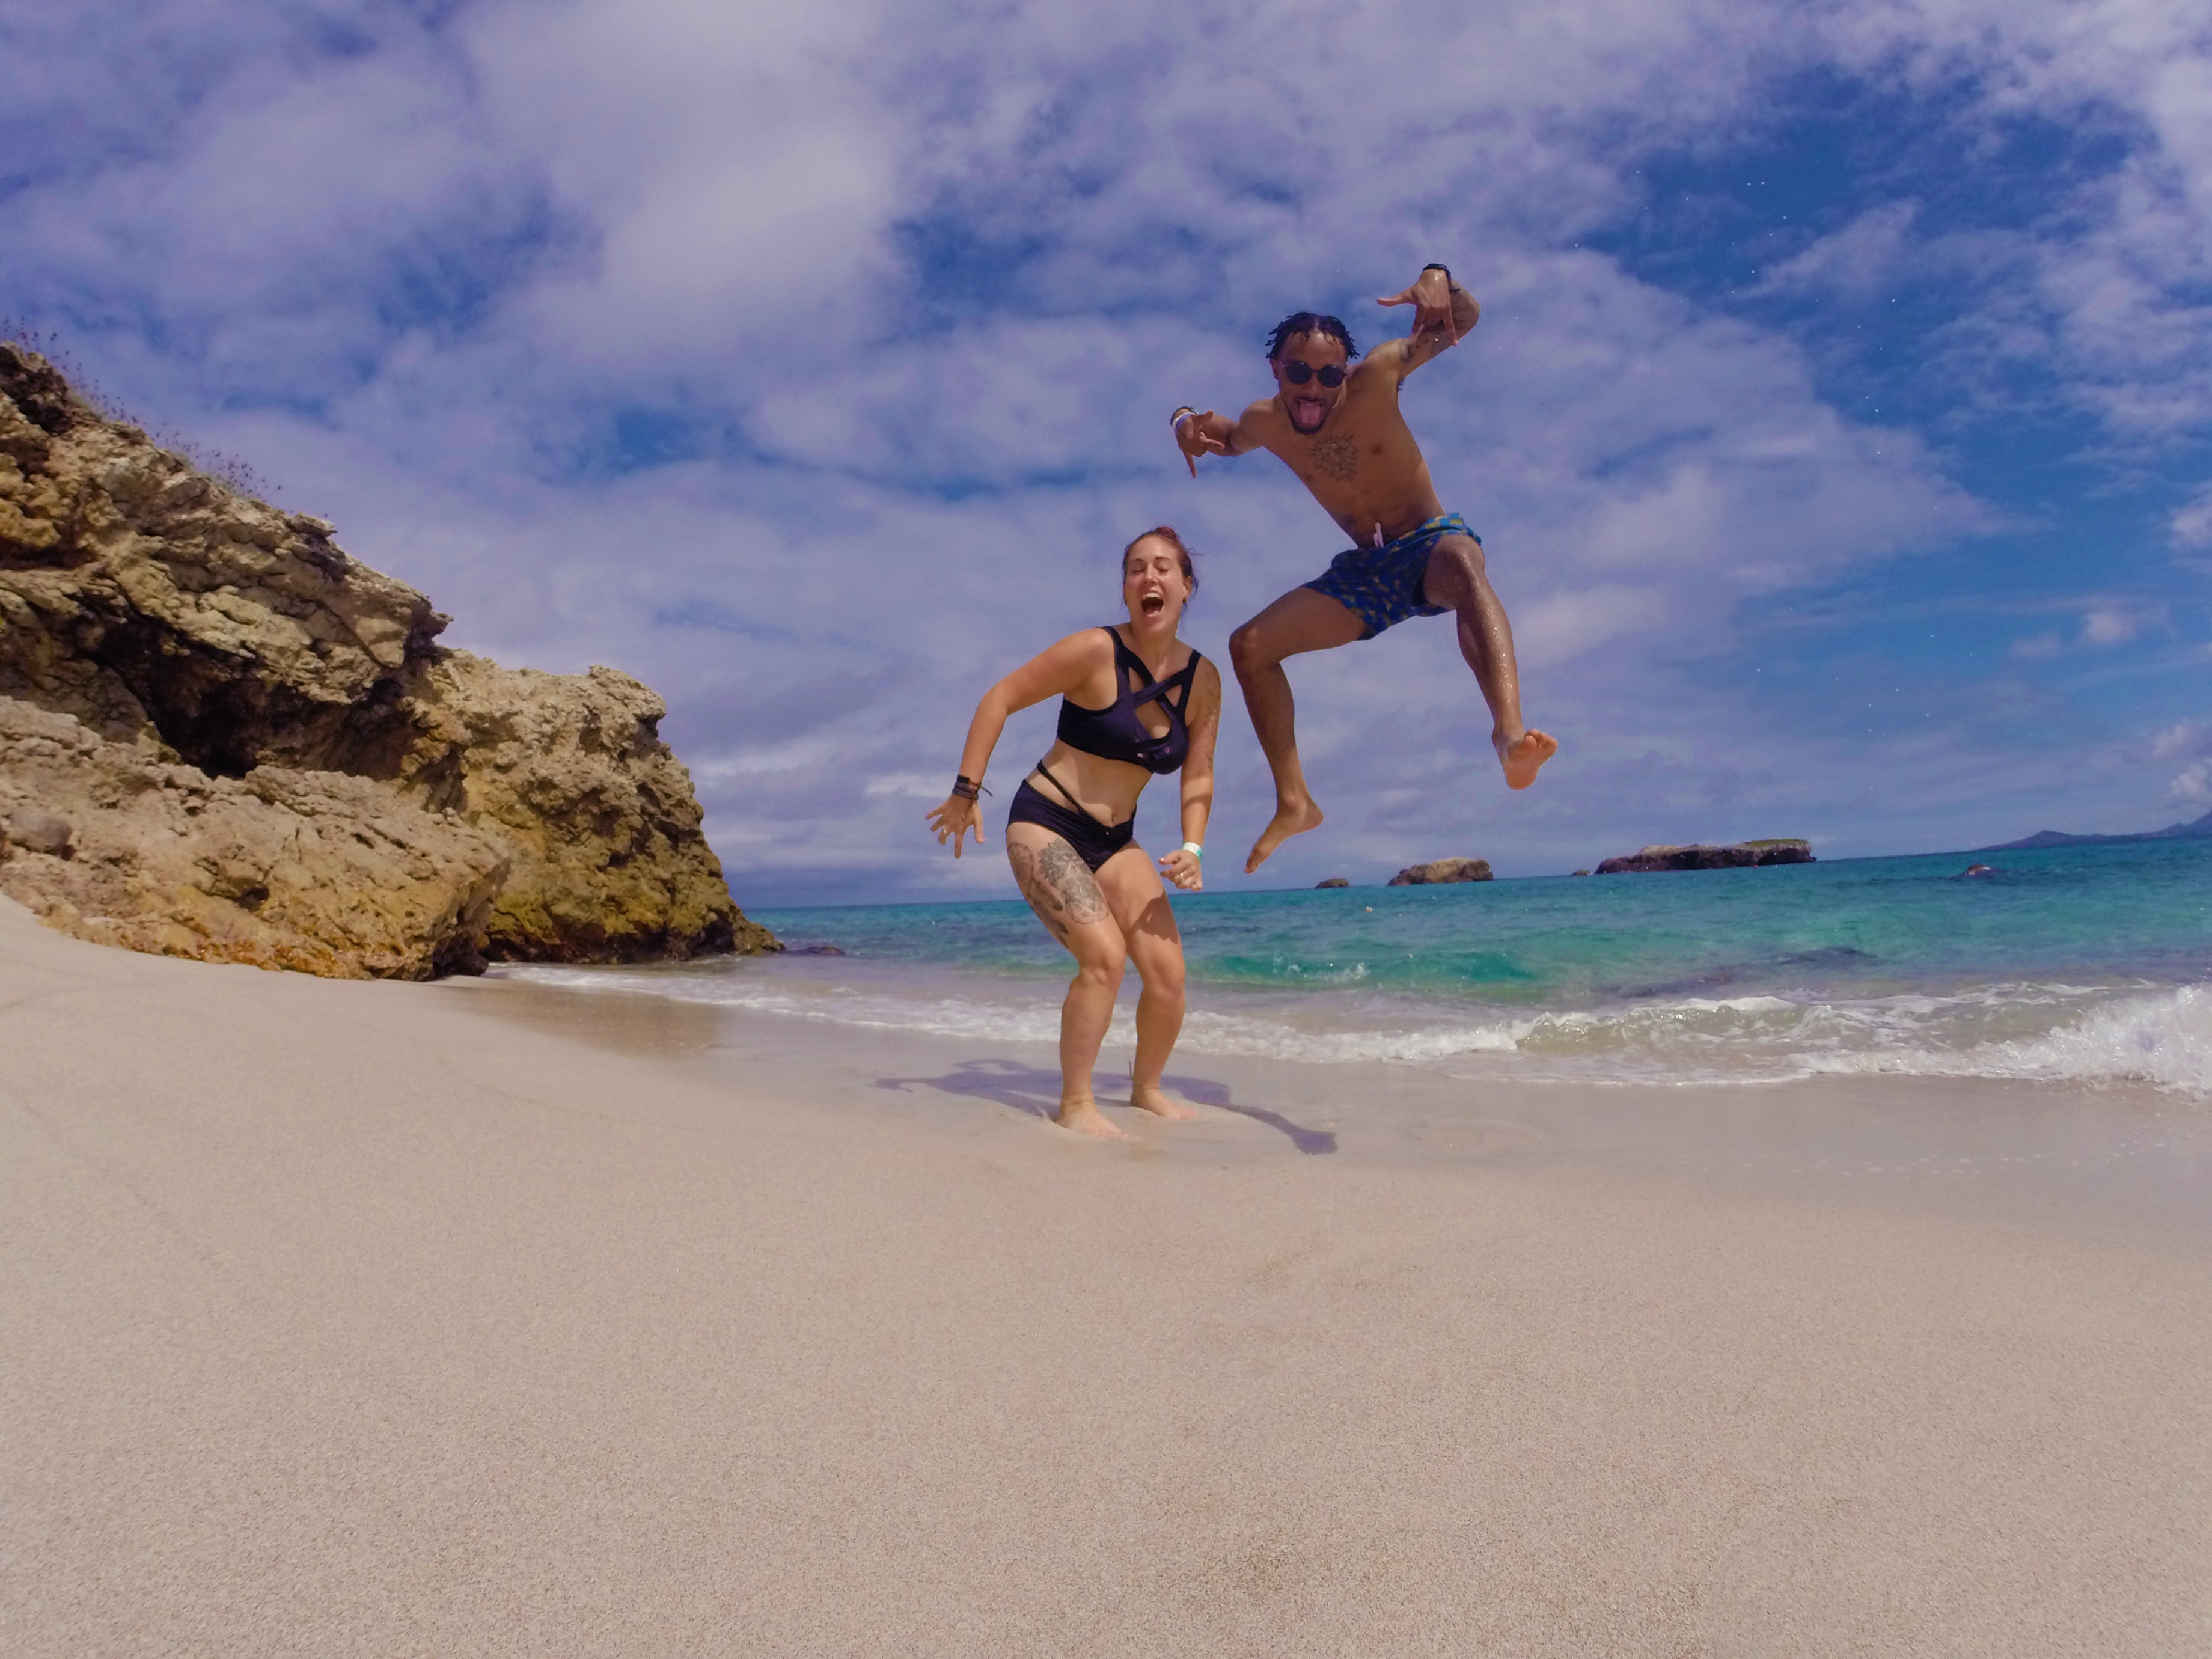 man and woman taking photo beside seashore during daytime